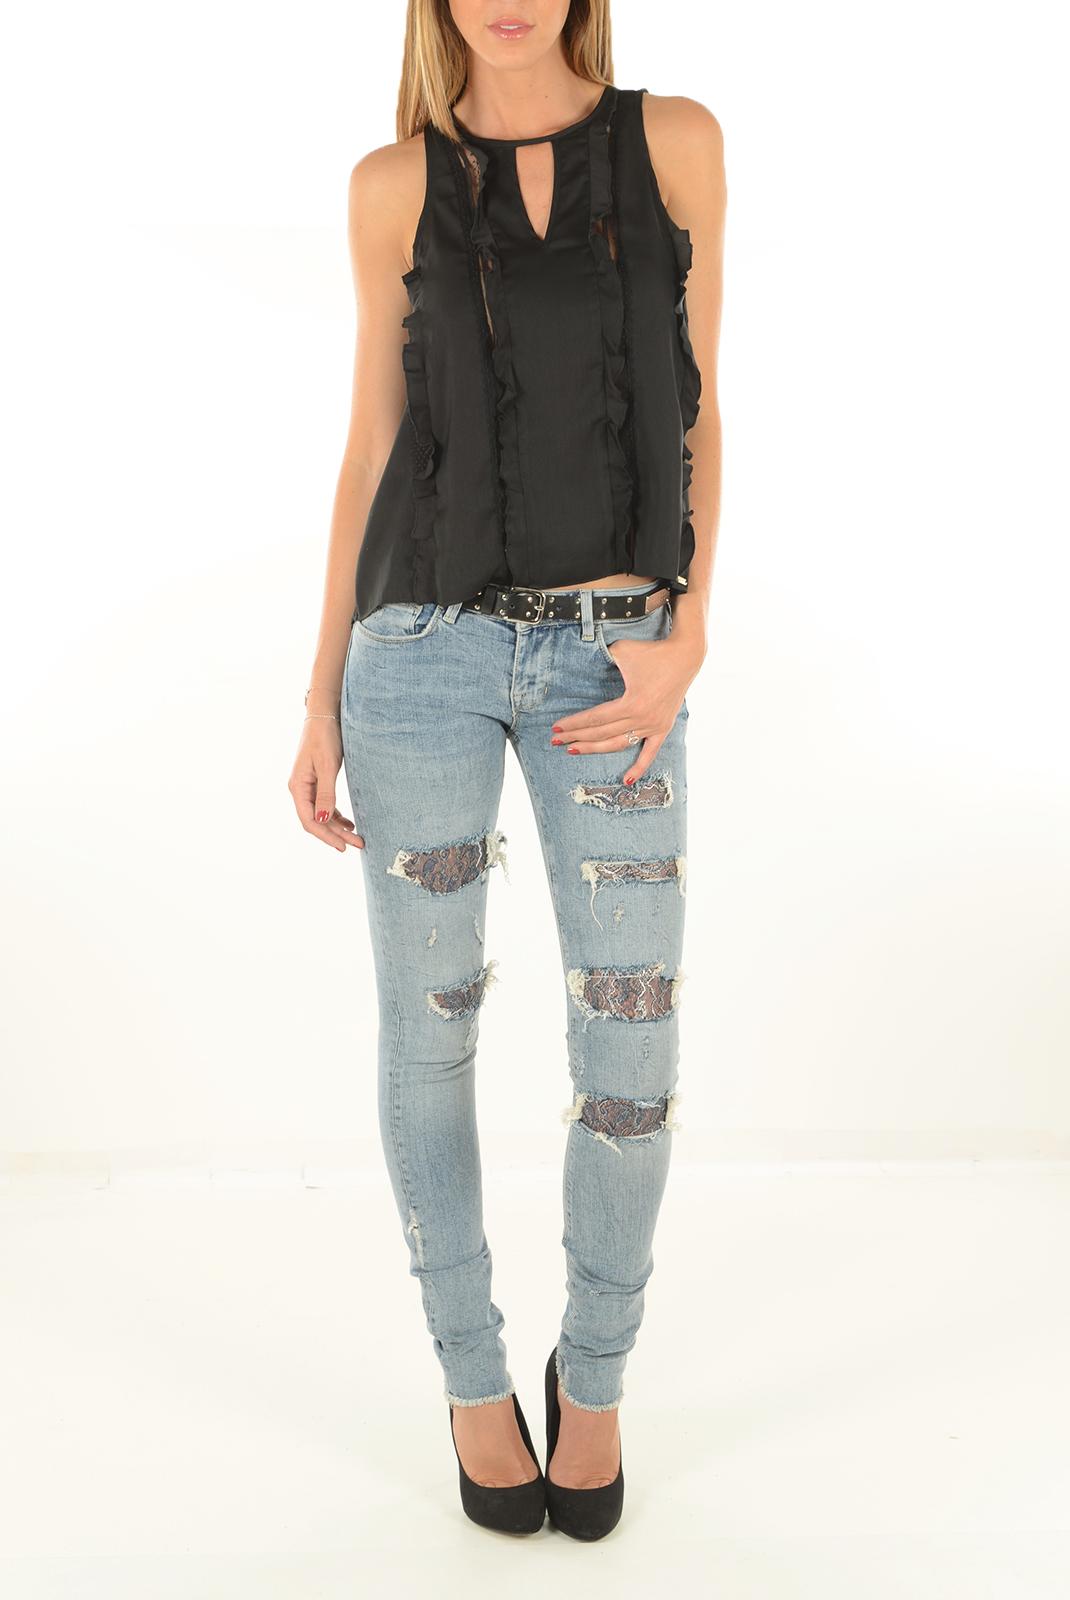 Tops & Tee shirts  Guess jeans W64H44W7VP0 A996 NOIR